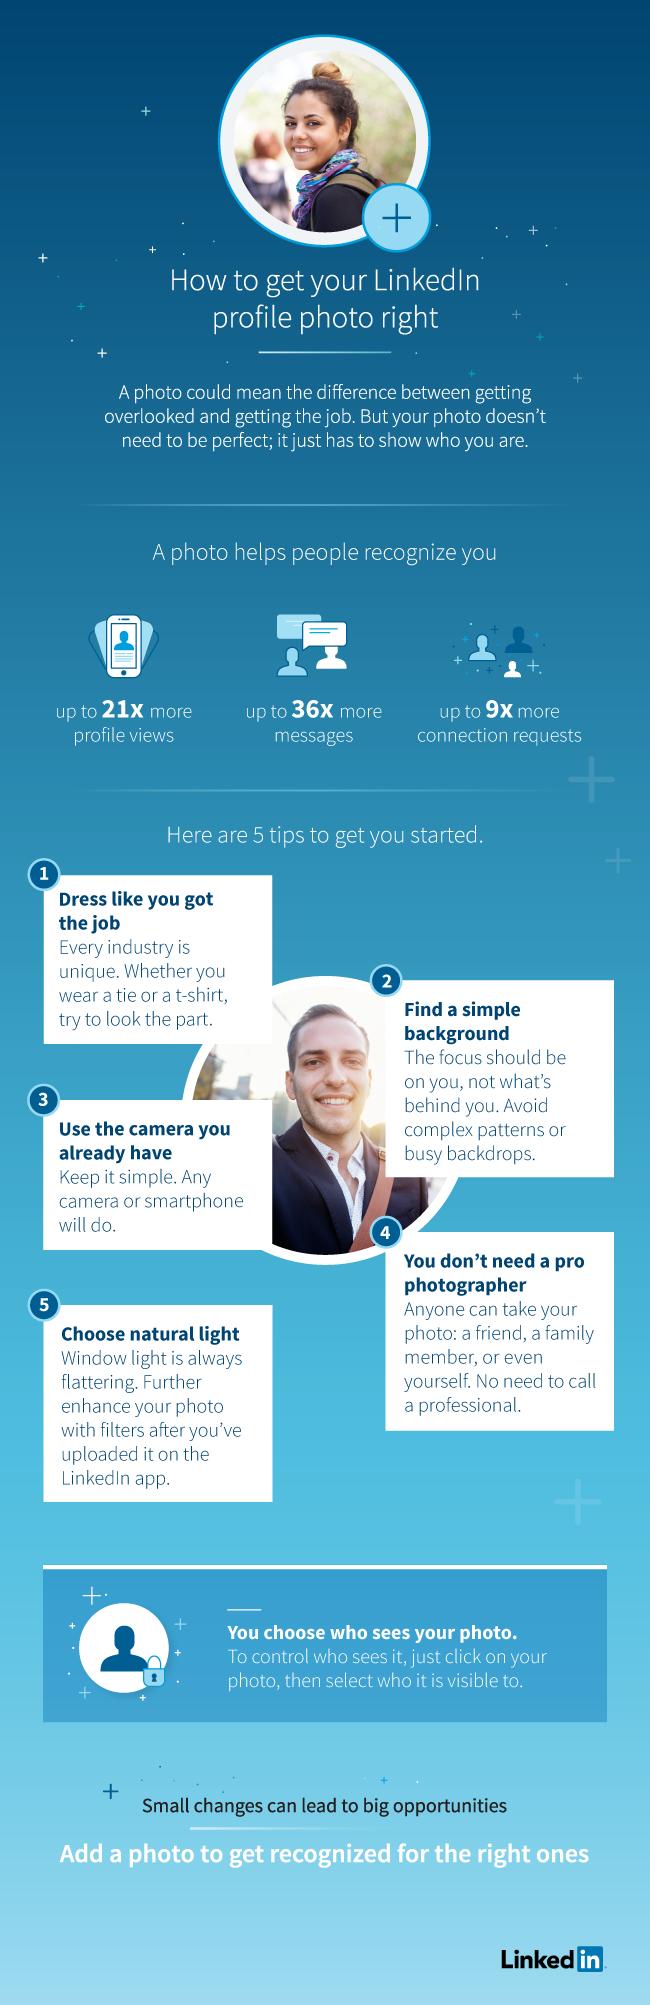 Introductie van fotofilters in mobiele LinkedIn app